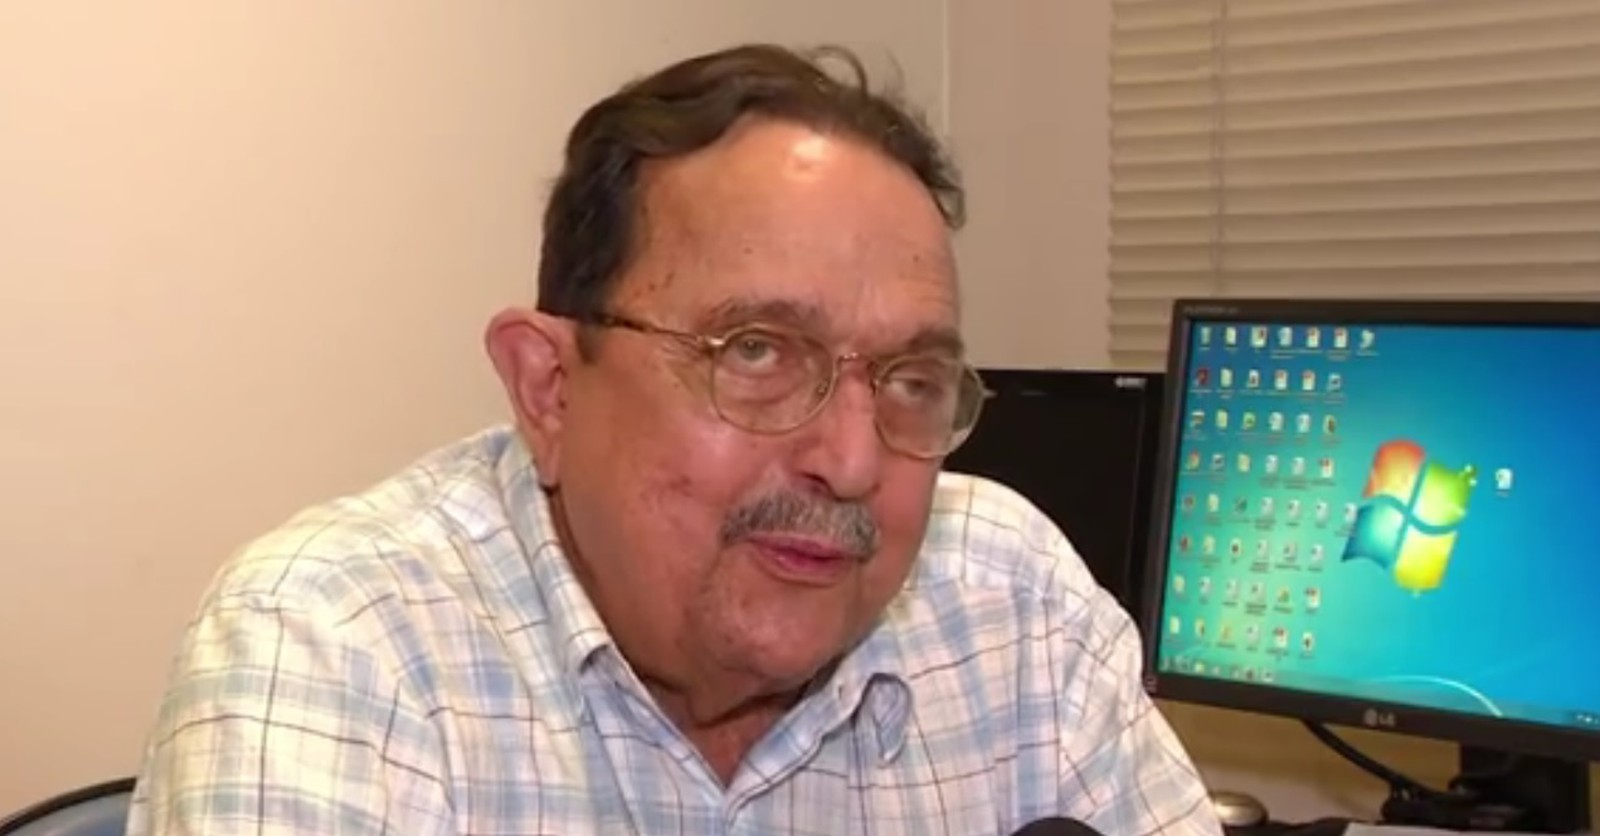 Carlos Araújo, ex-marido de Dilma Rousseff (Foto: Reprodução/RBS TV)